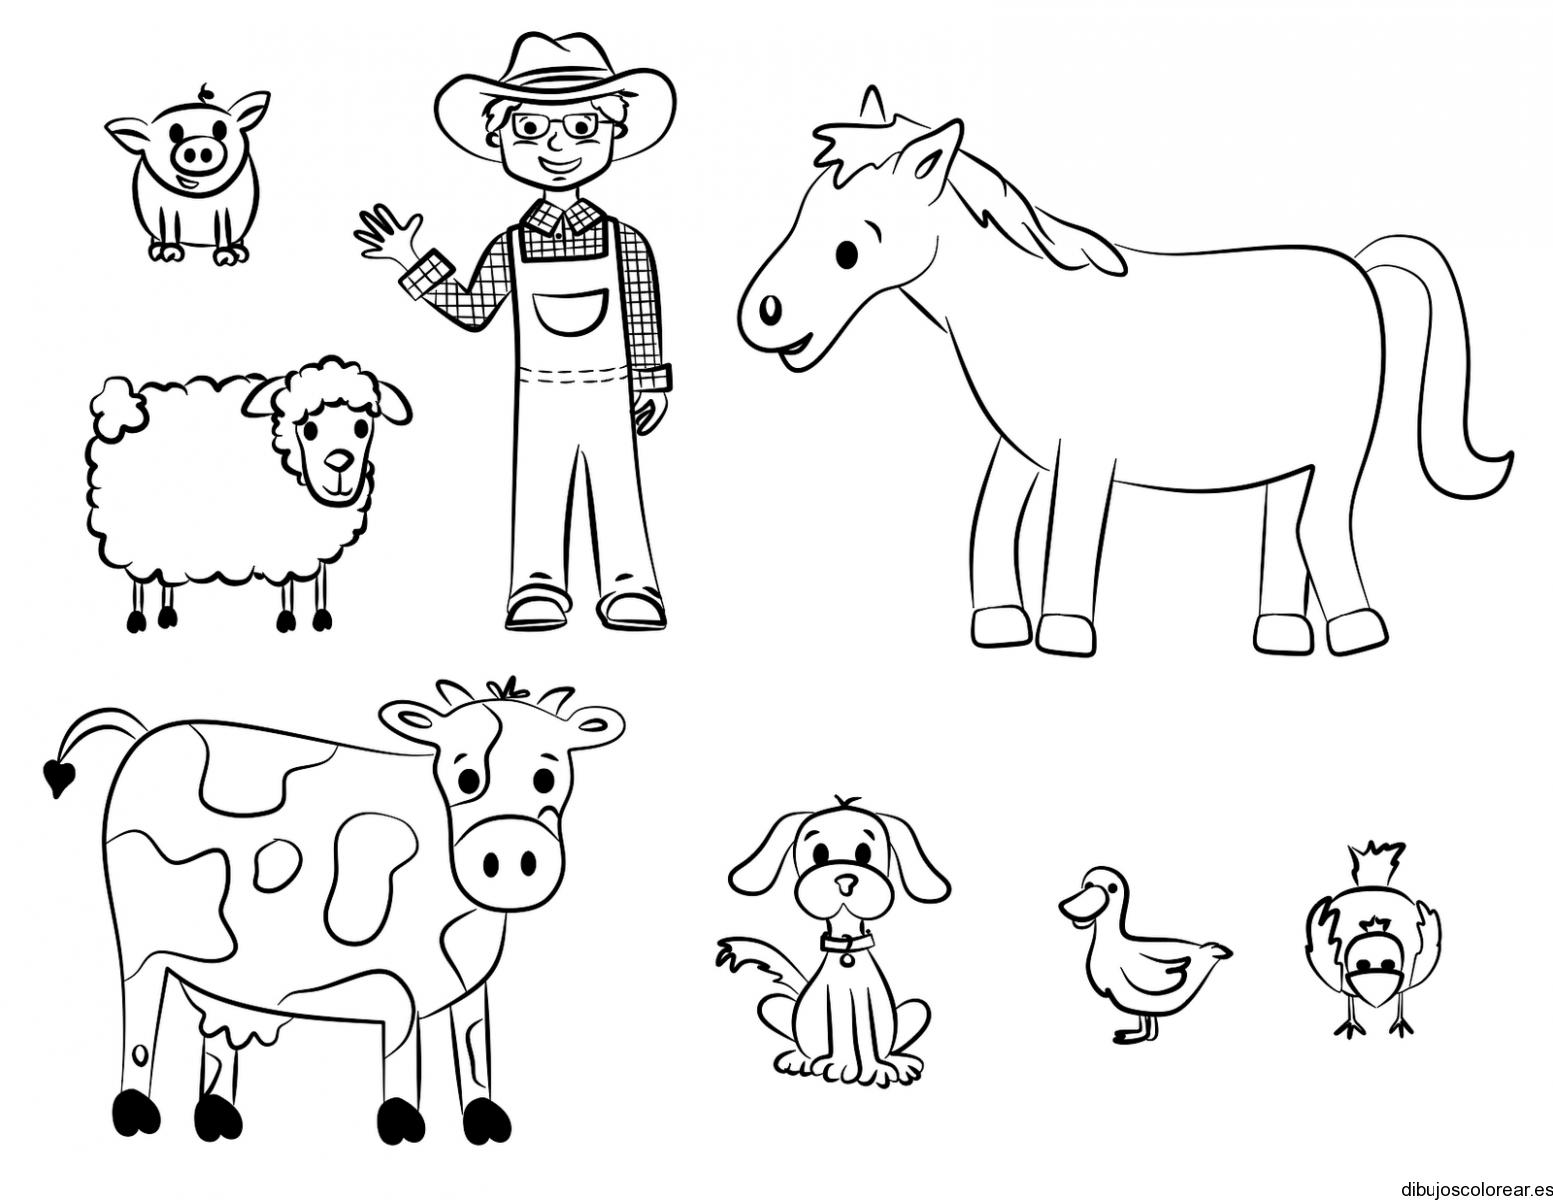 colorear granjero - Cerca amb Google | Projectes E.I | Pinterest ...